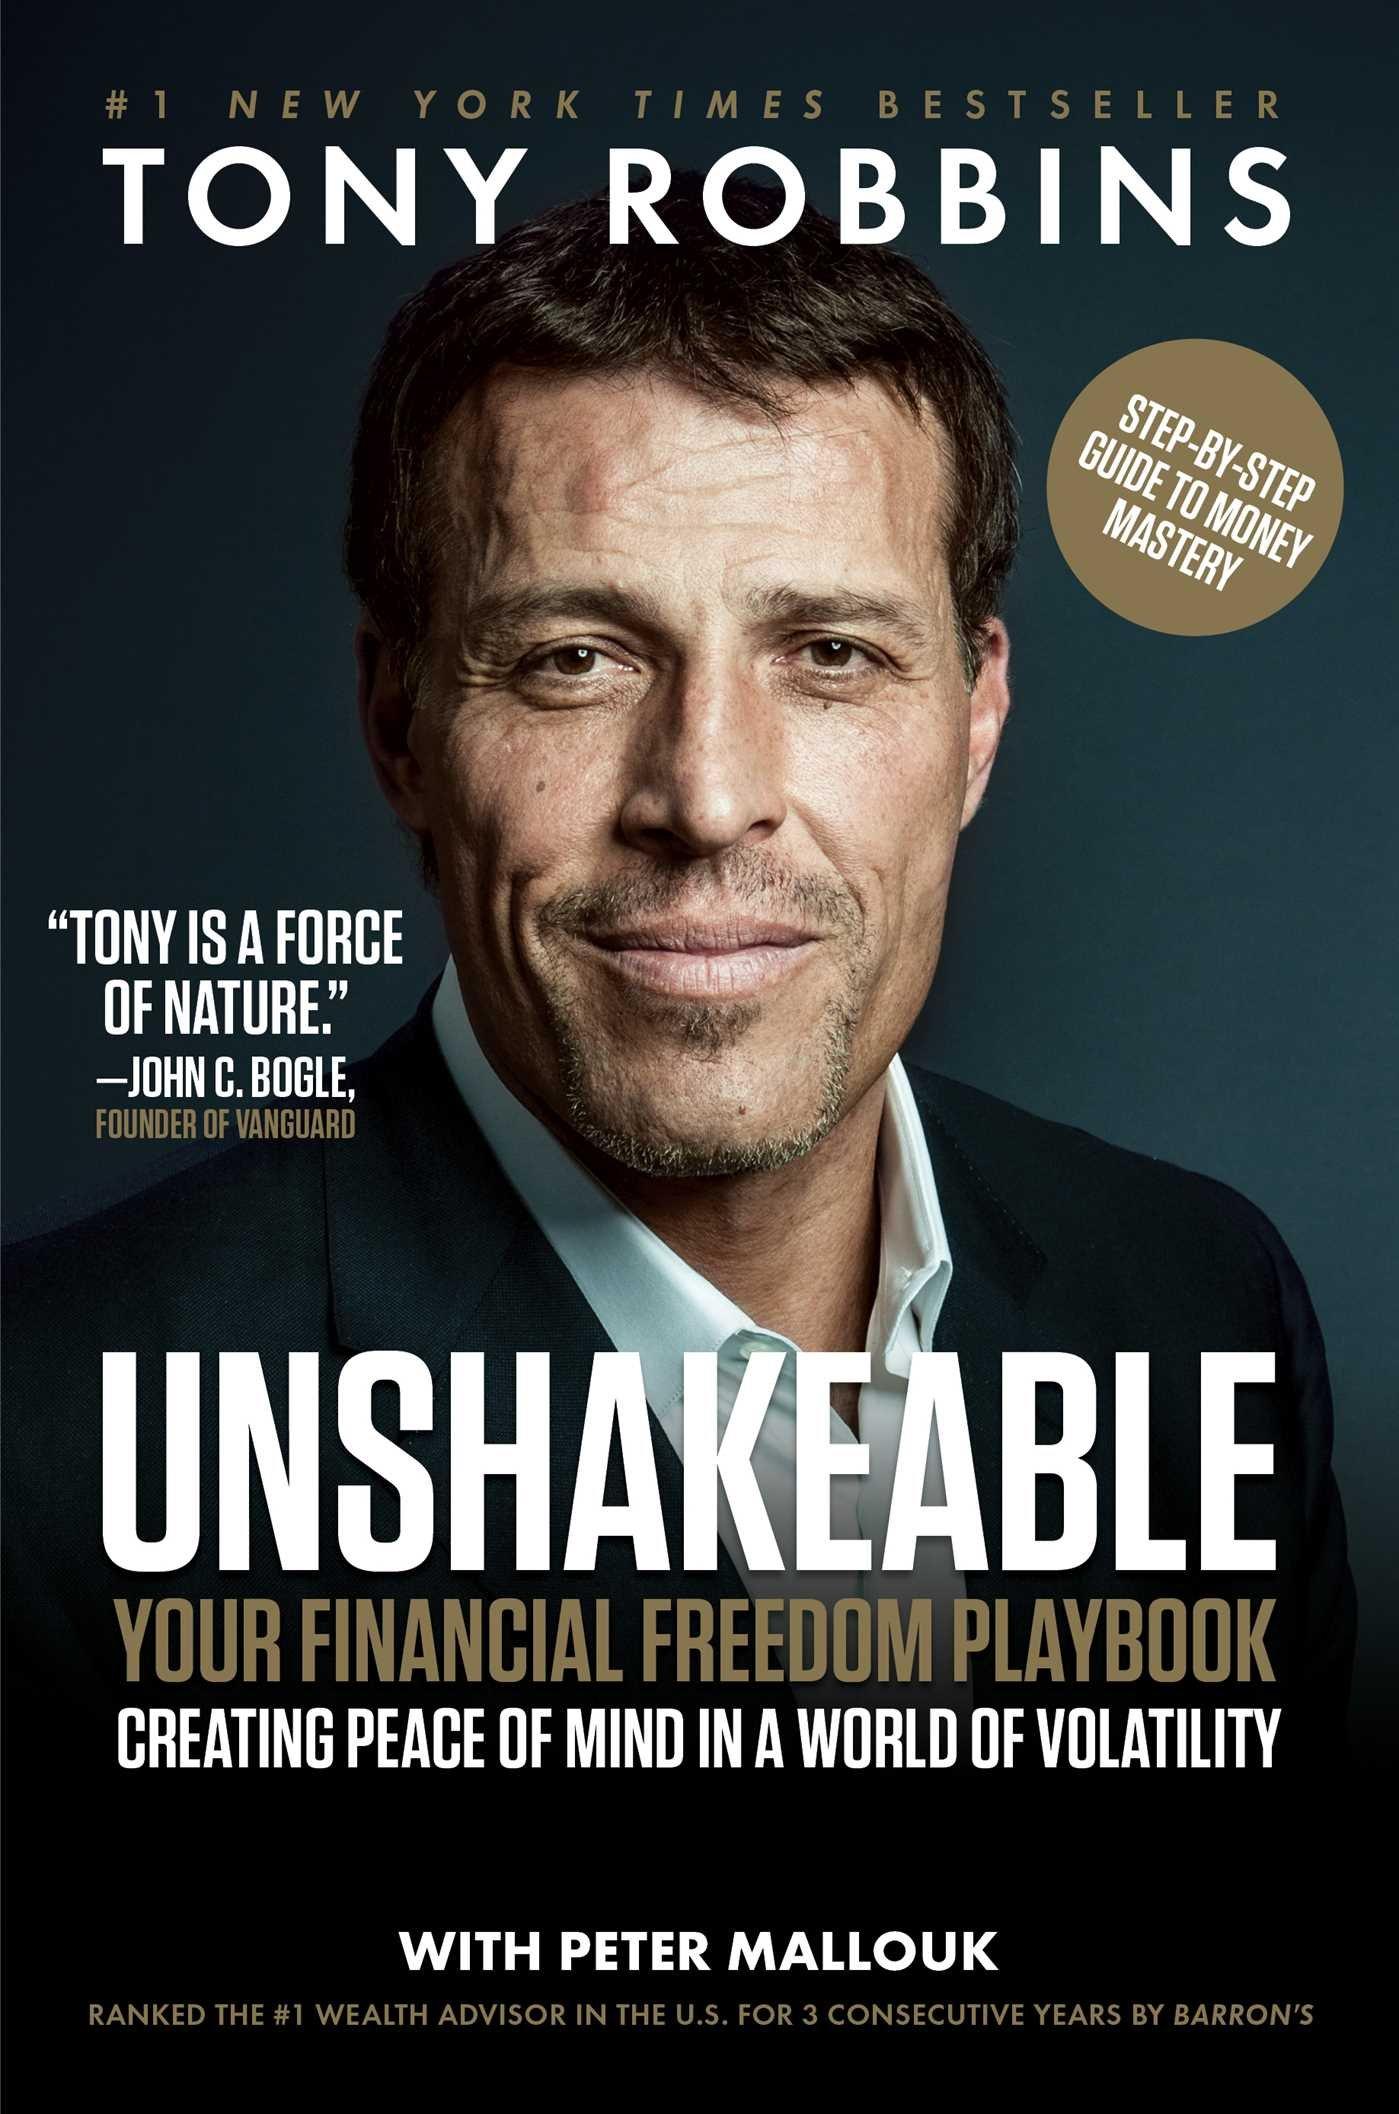 Buy Tony Robbins Unshakeable Now!